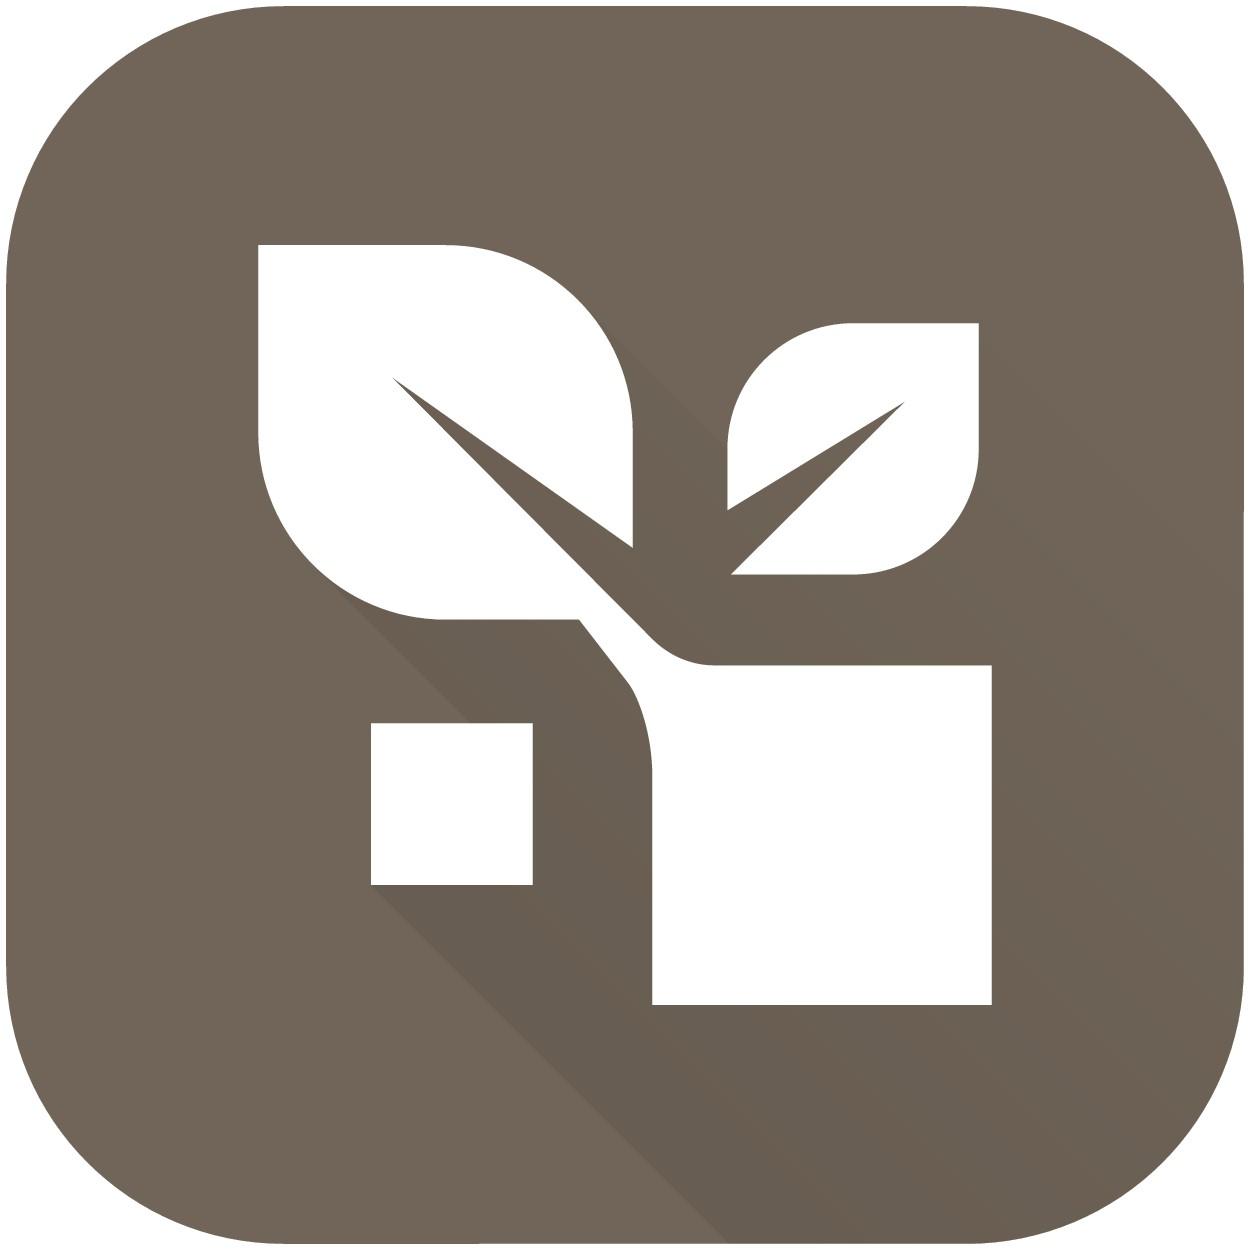 Create a logo for a new app development company CodeNursery.